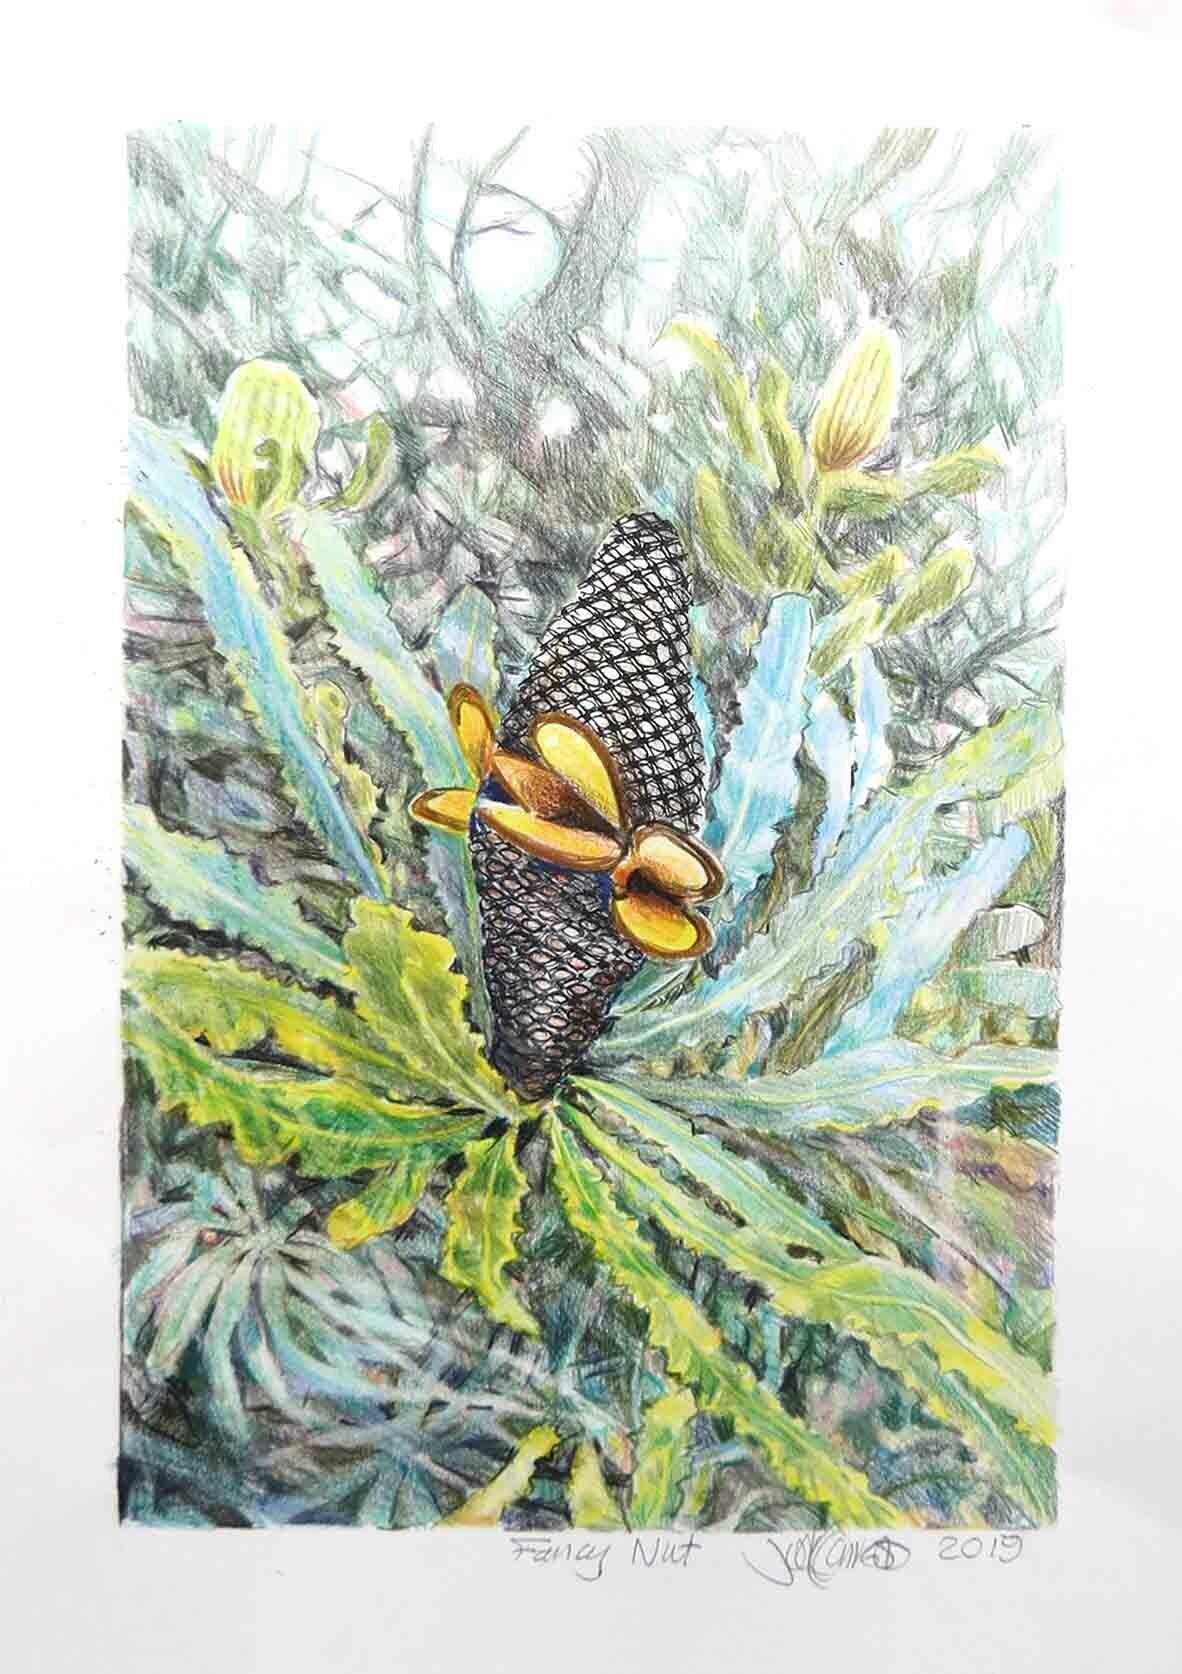 22. Judith Forrest, Fancy Nut, 2019, mixed media on paper, 42.5 x 29.5 cm $300